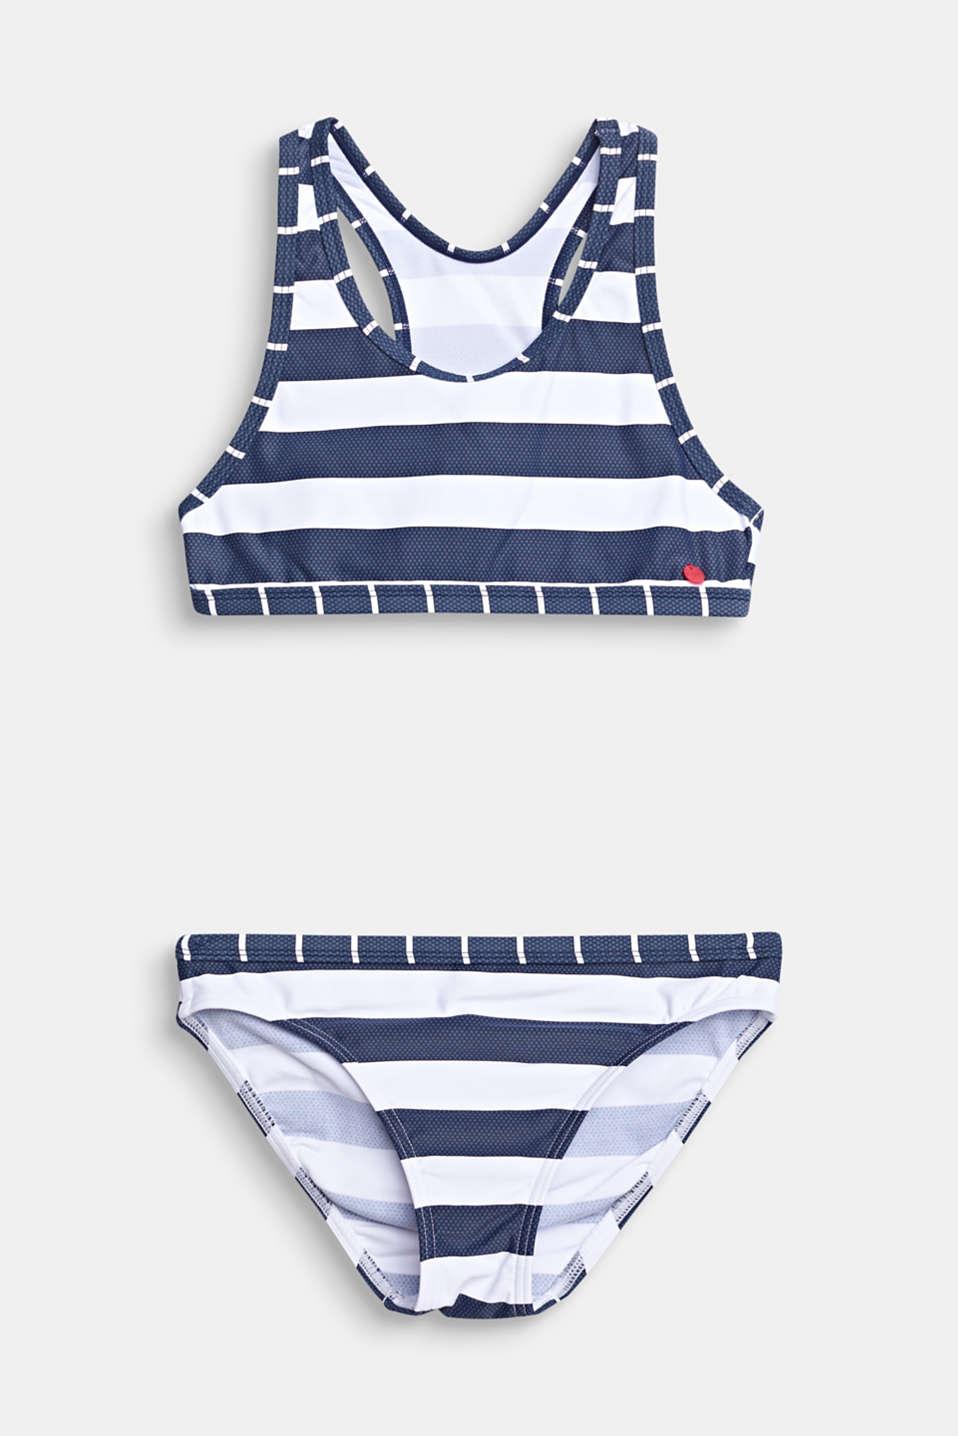 Crop top bikini set with stripes, DARK BLUE, detail image number 0